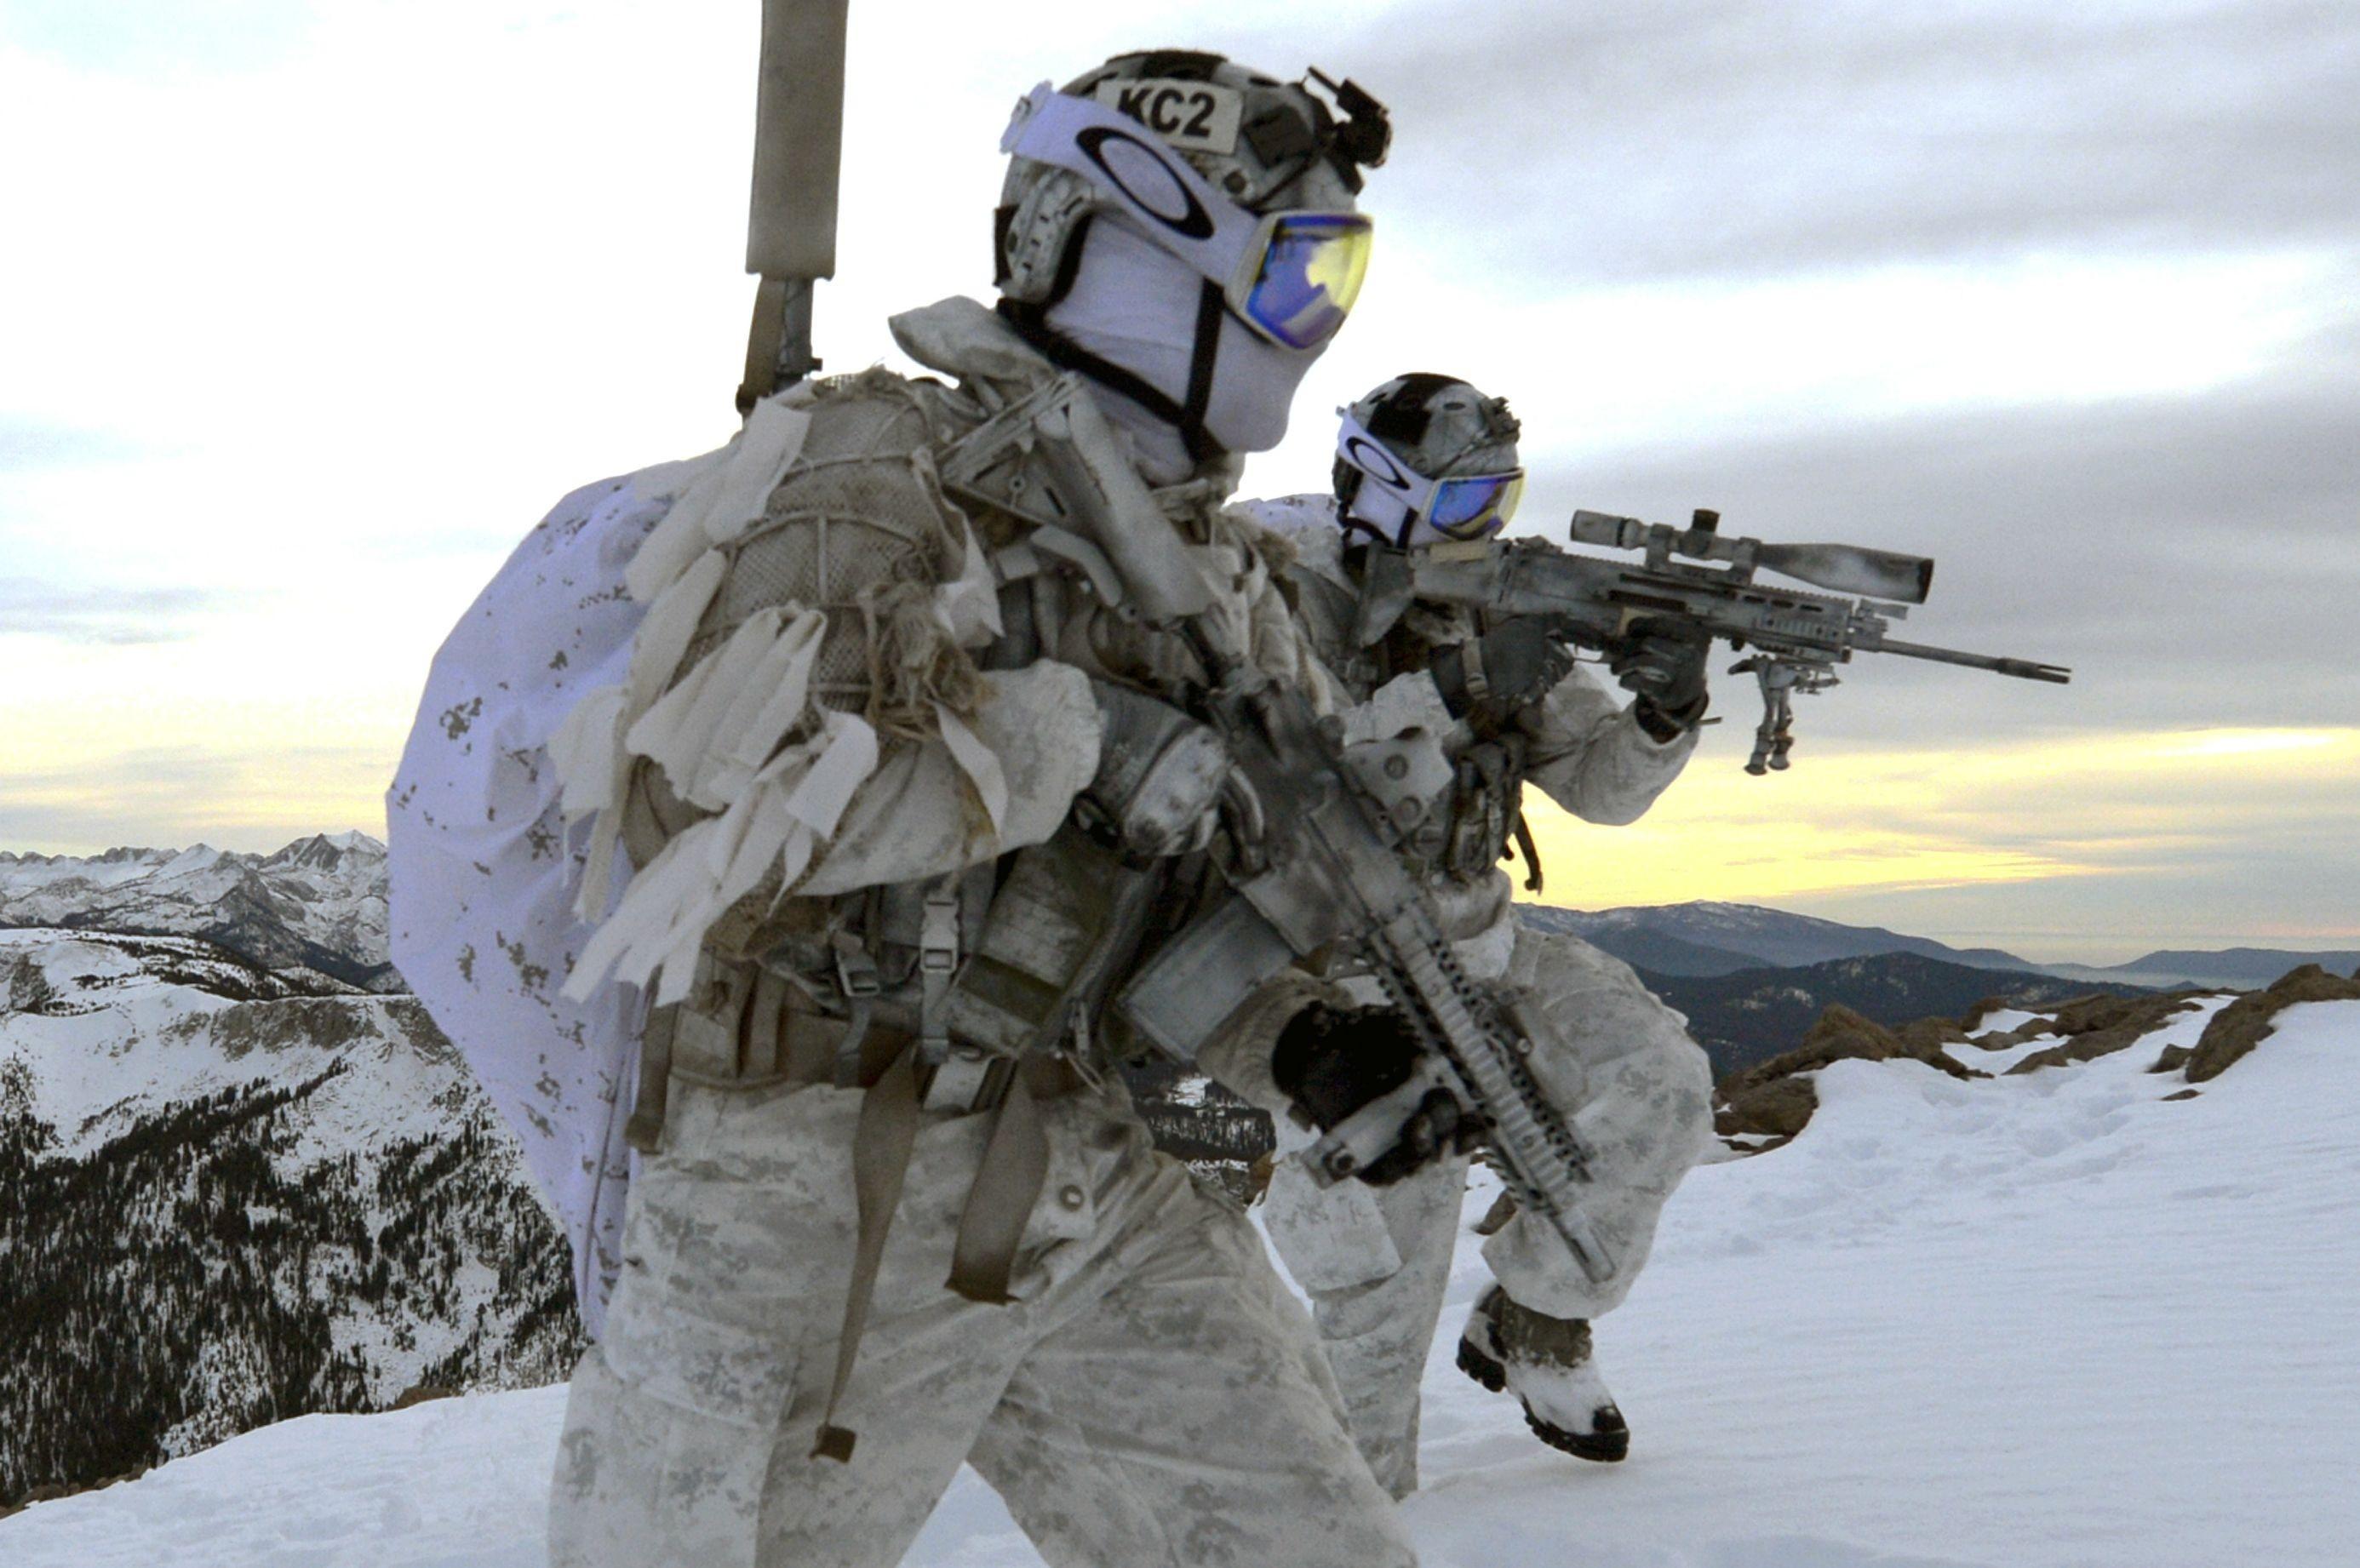 People military Navy SEALs winter snow Mk 18 Mod 0 FN SCAR